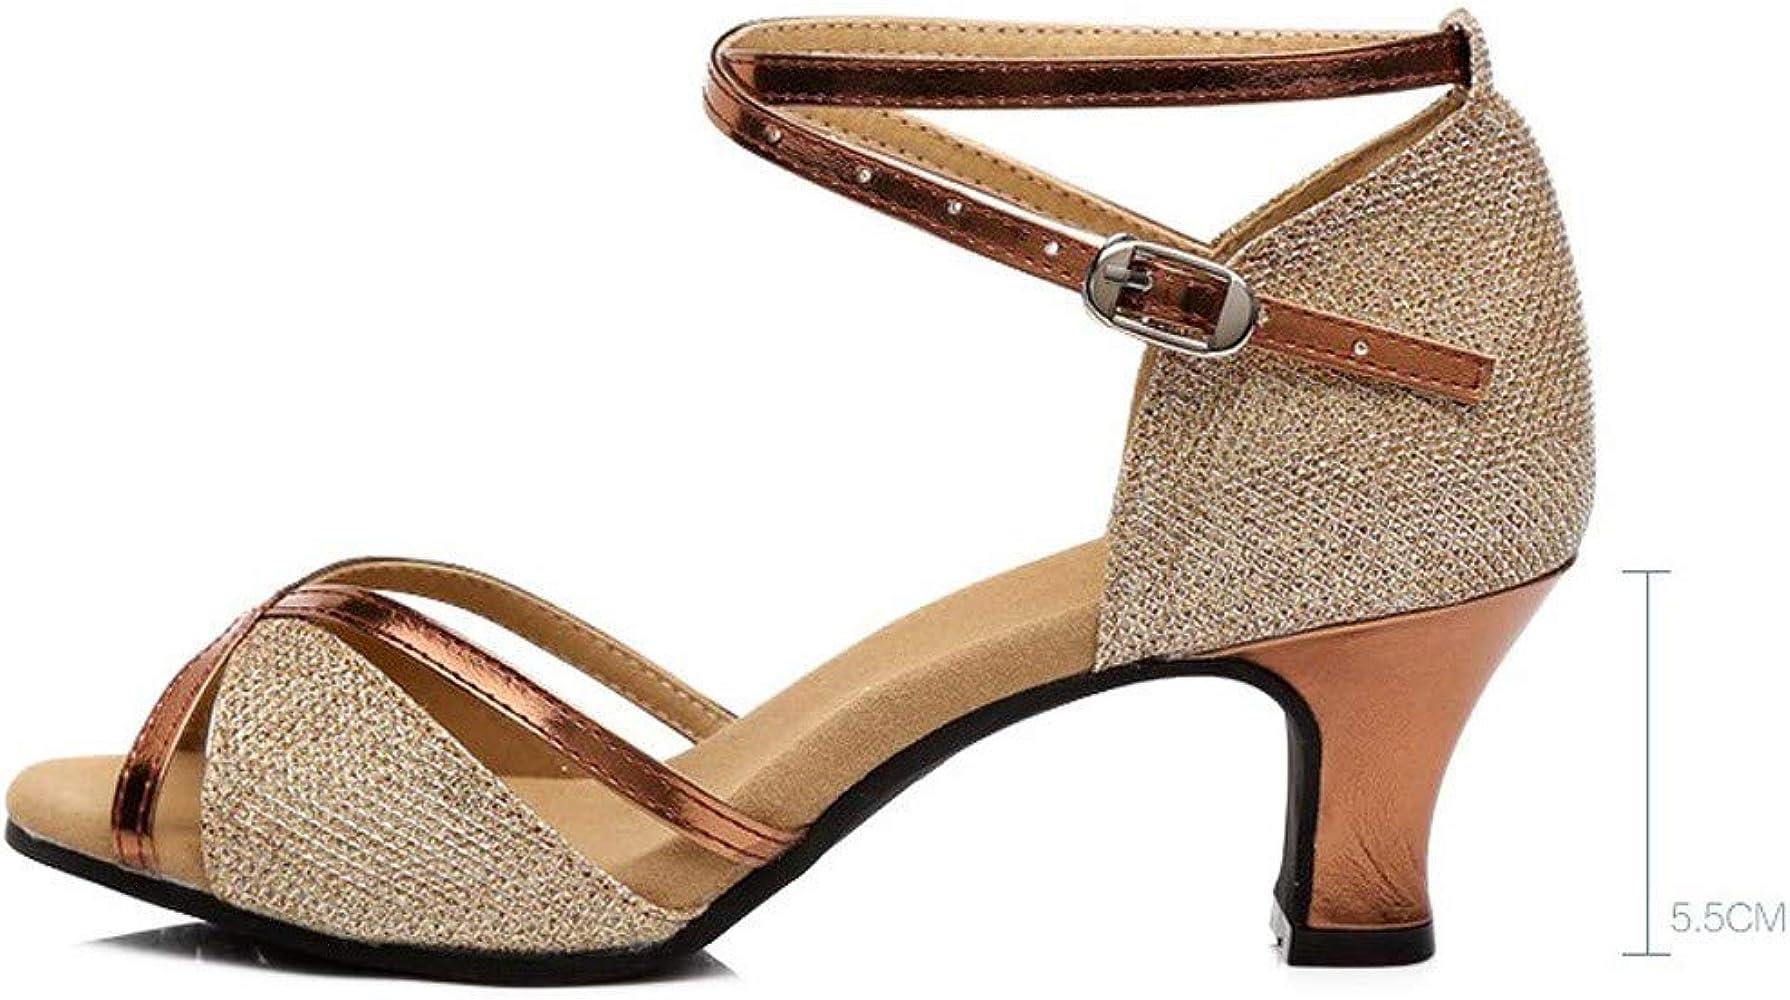 HCFKJ Ladies Women Summer Dance Shoes,Rumba Waltz Prom Ballroom Latin Salsa Dance Shoes Square Comfy Size 2-8